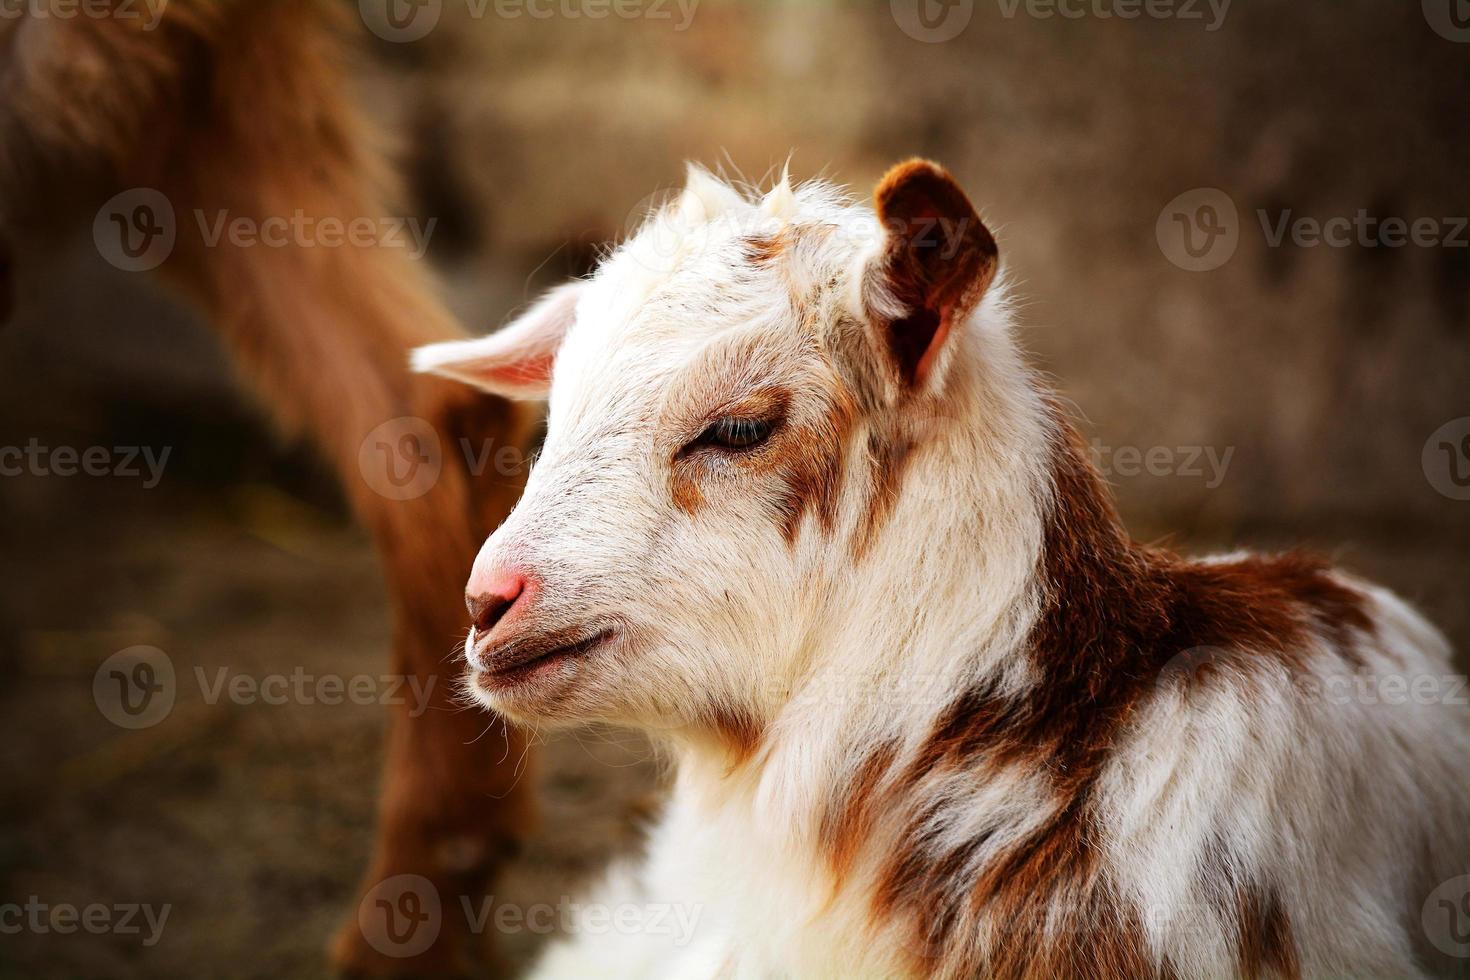 simpatica capra kinder marrone e bianca in una fattoria foto